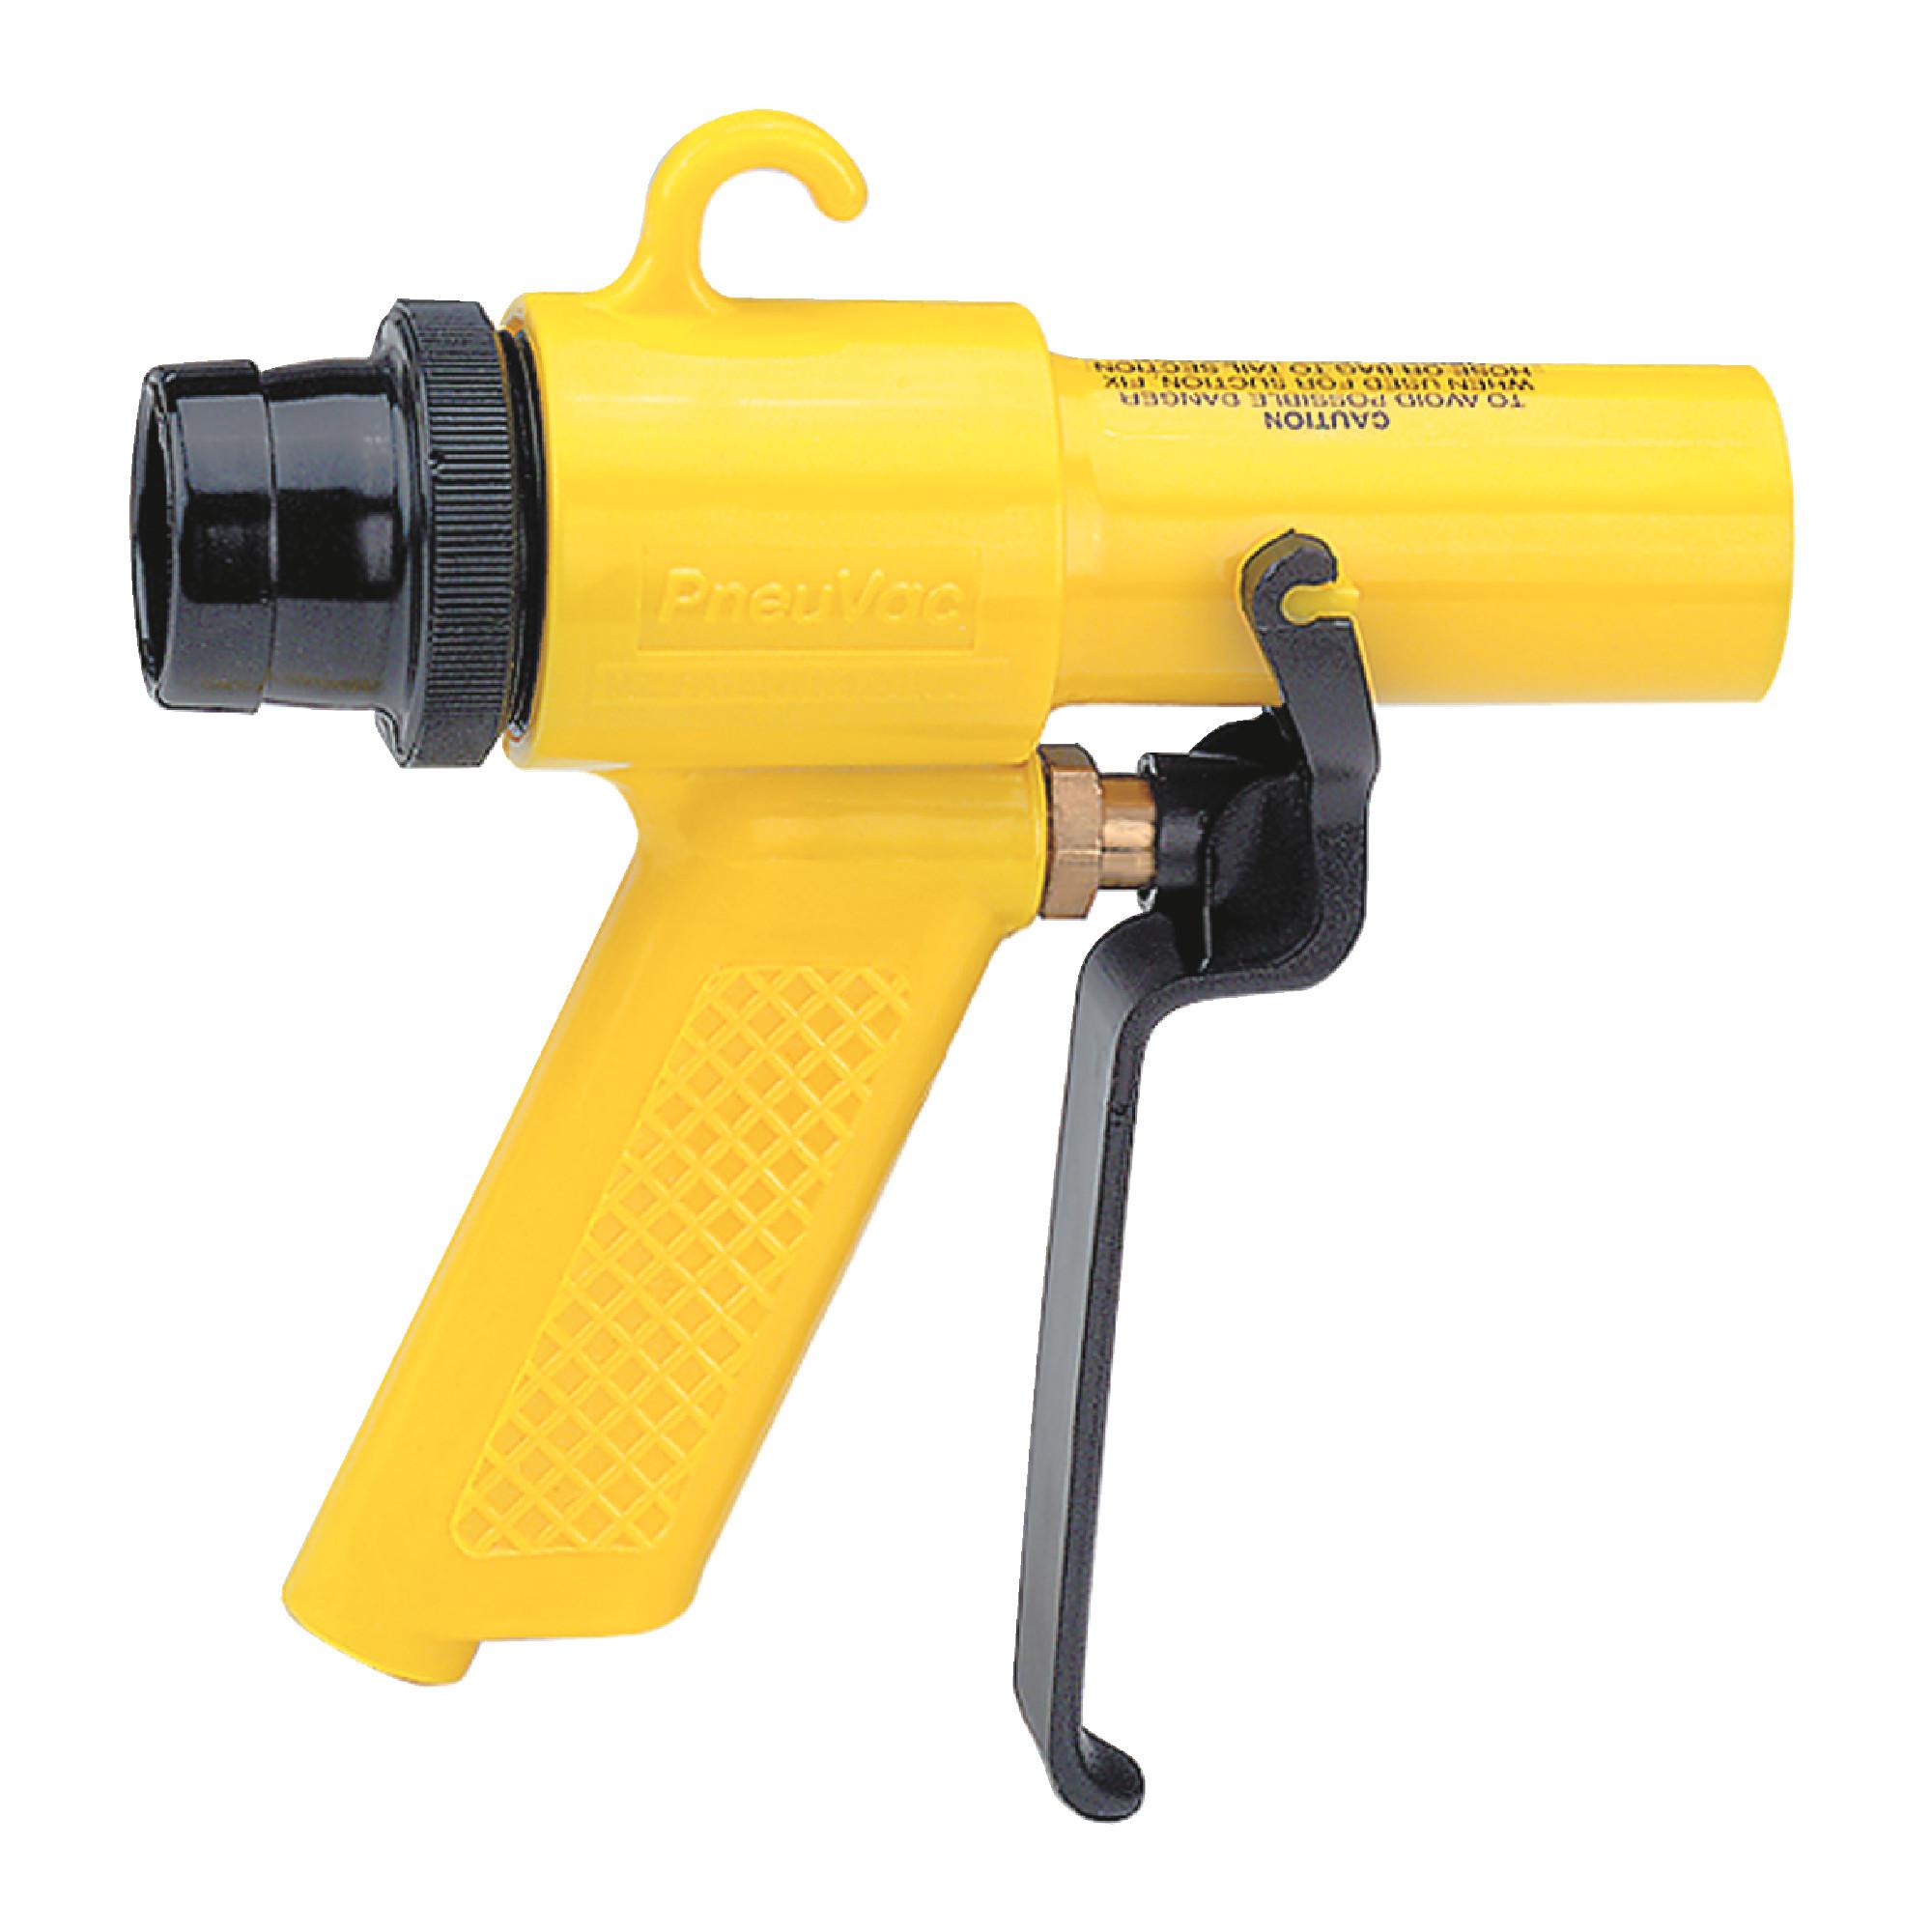 PneuVac Pistol Air Gun